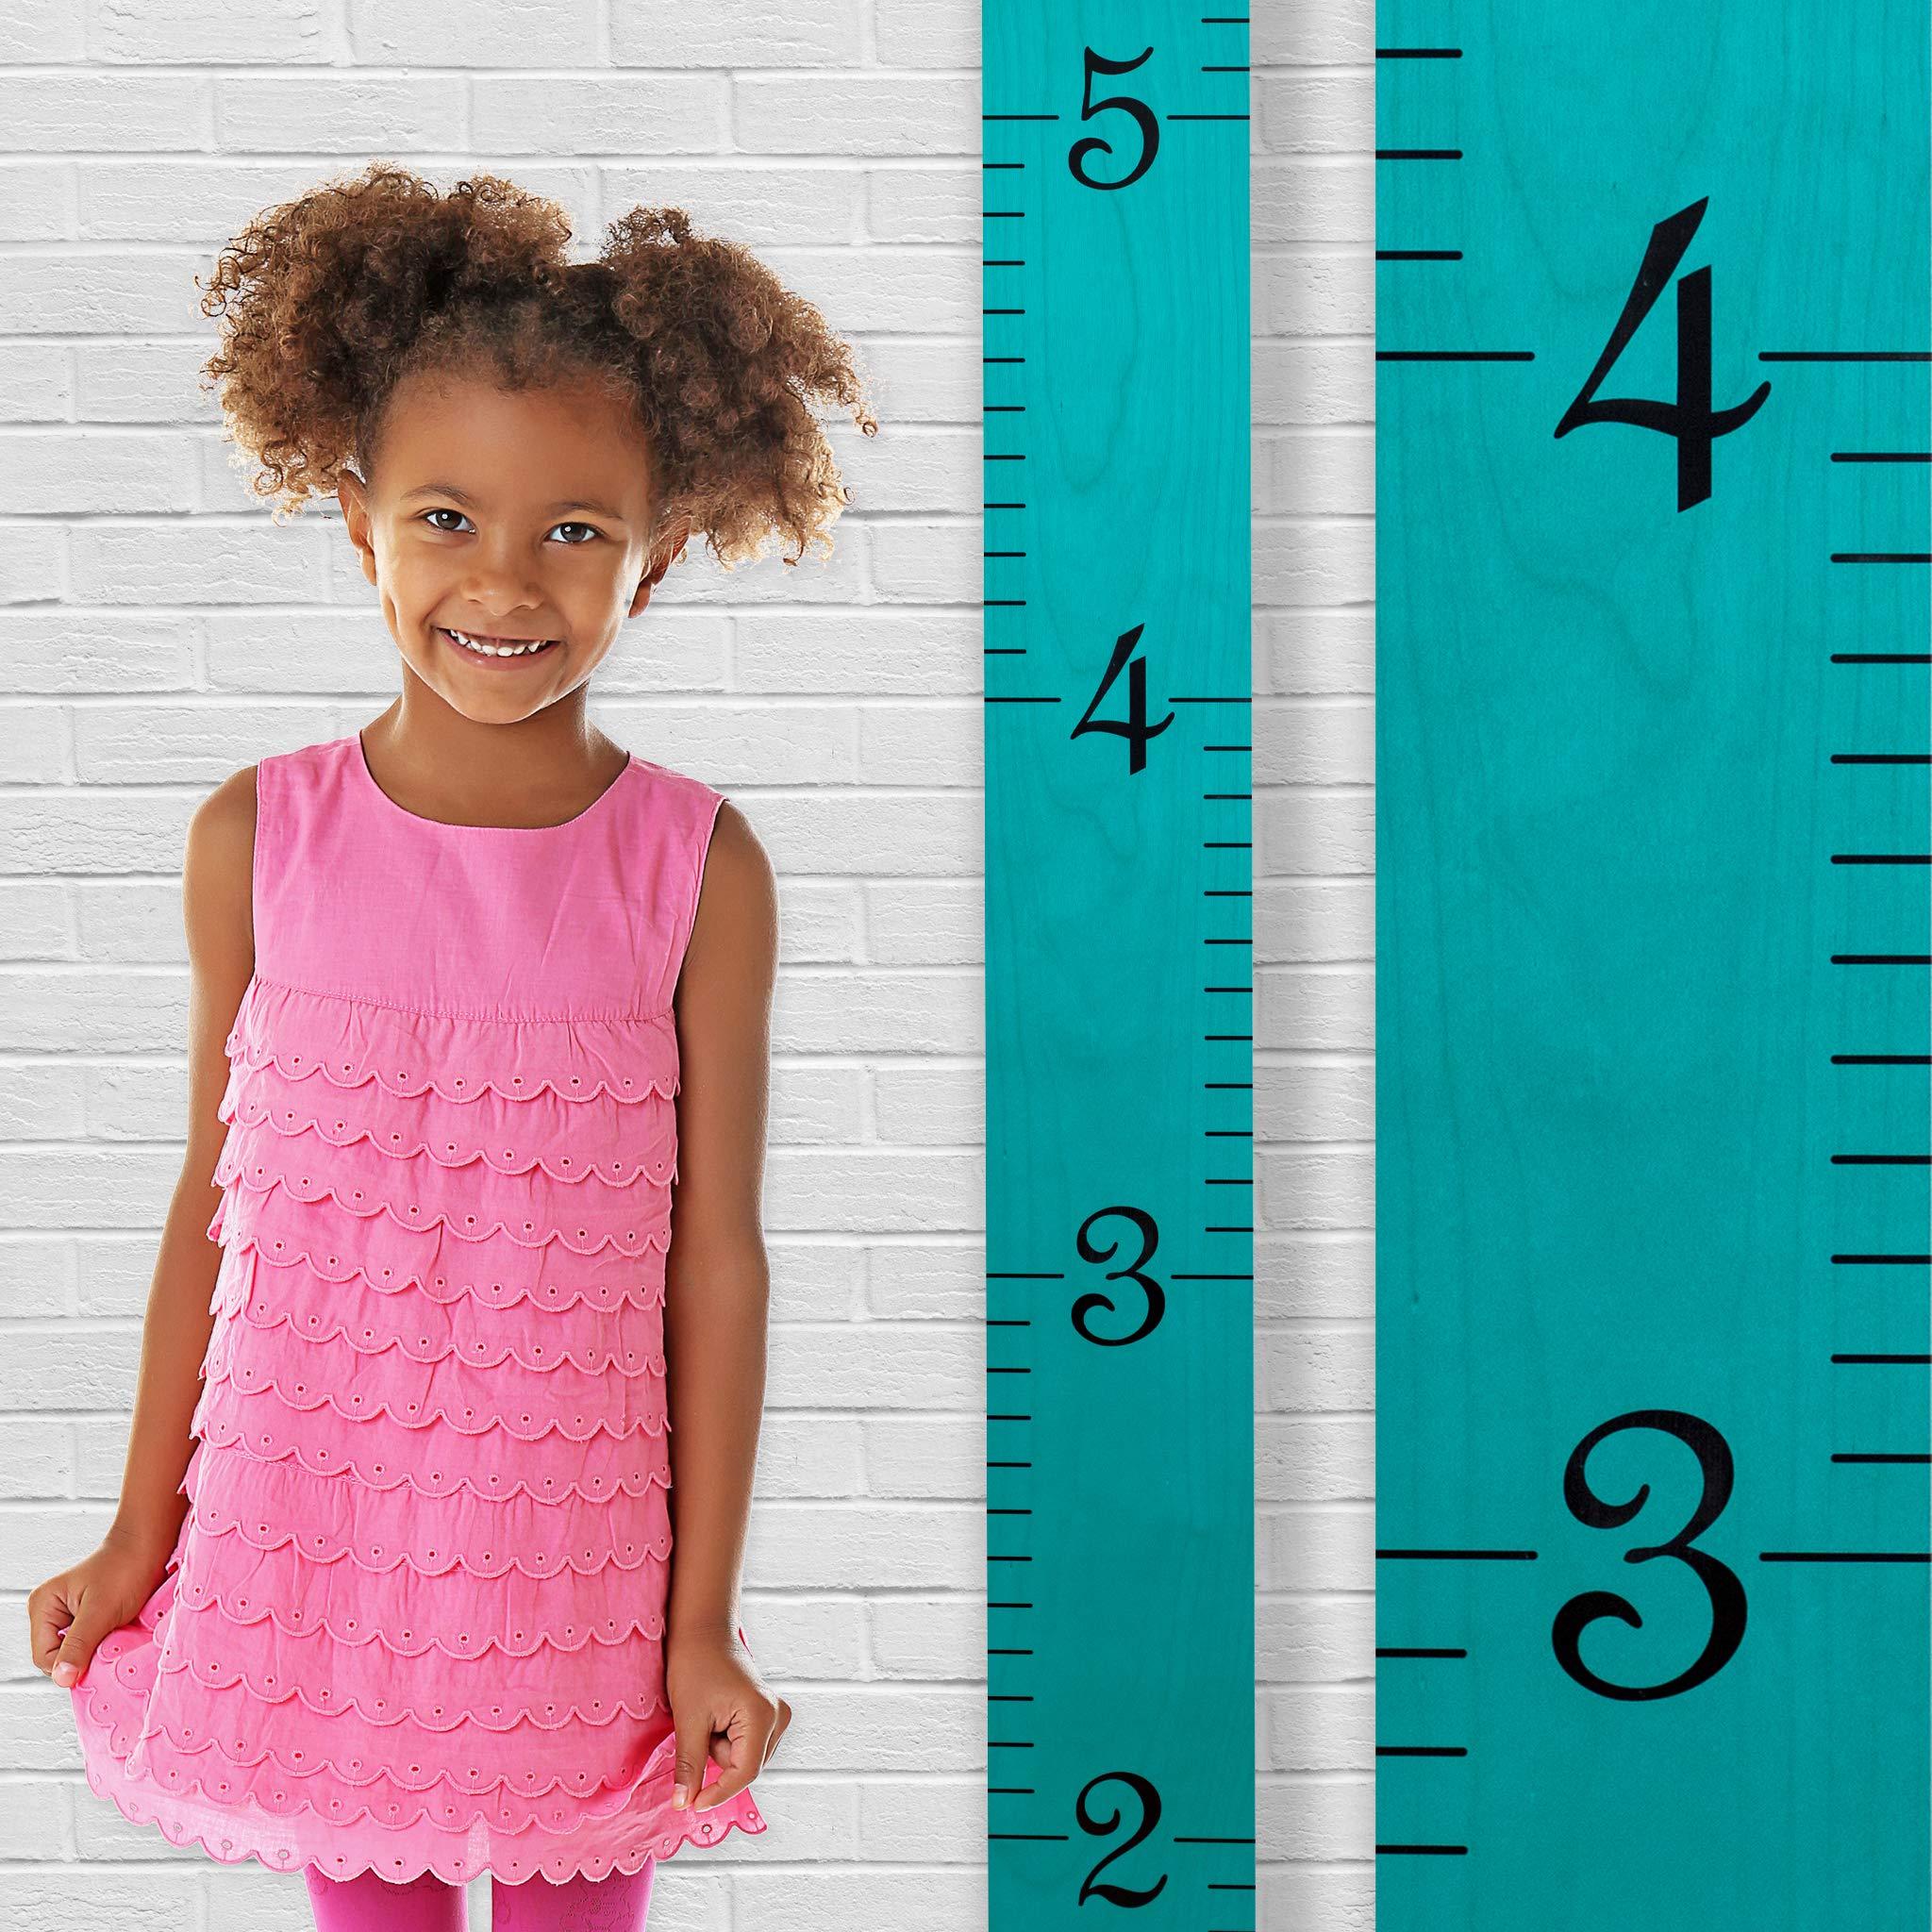 Growth Chart Art | Growth Ruler Wood Chart for Boys & Girls | Height Ruler | Measuring Kids Height Wall Décor | Kids Ruler in Robins Egg Blue